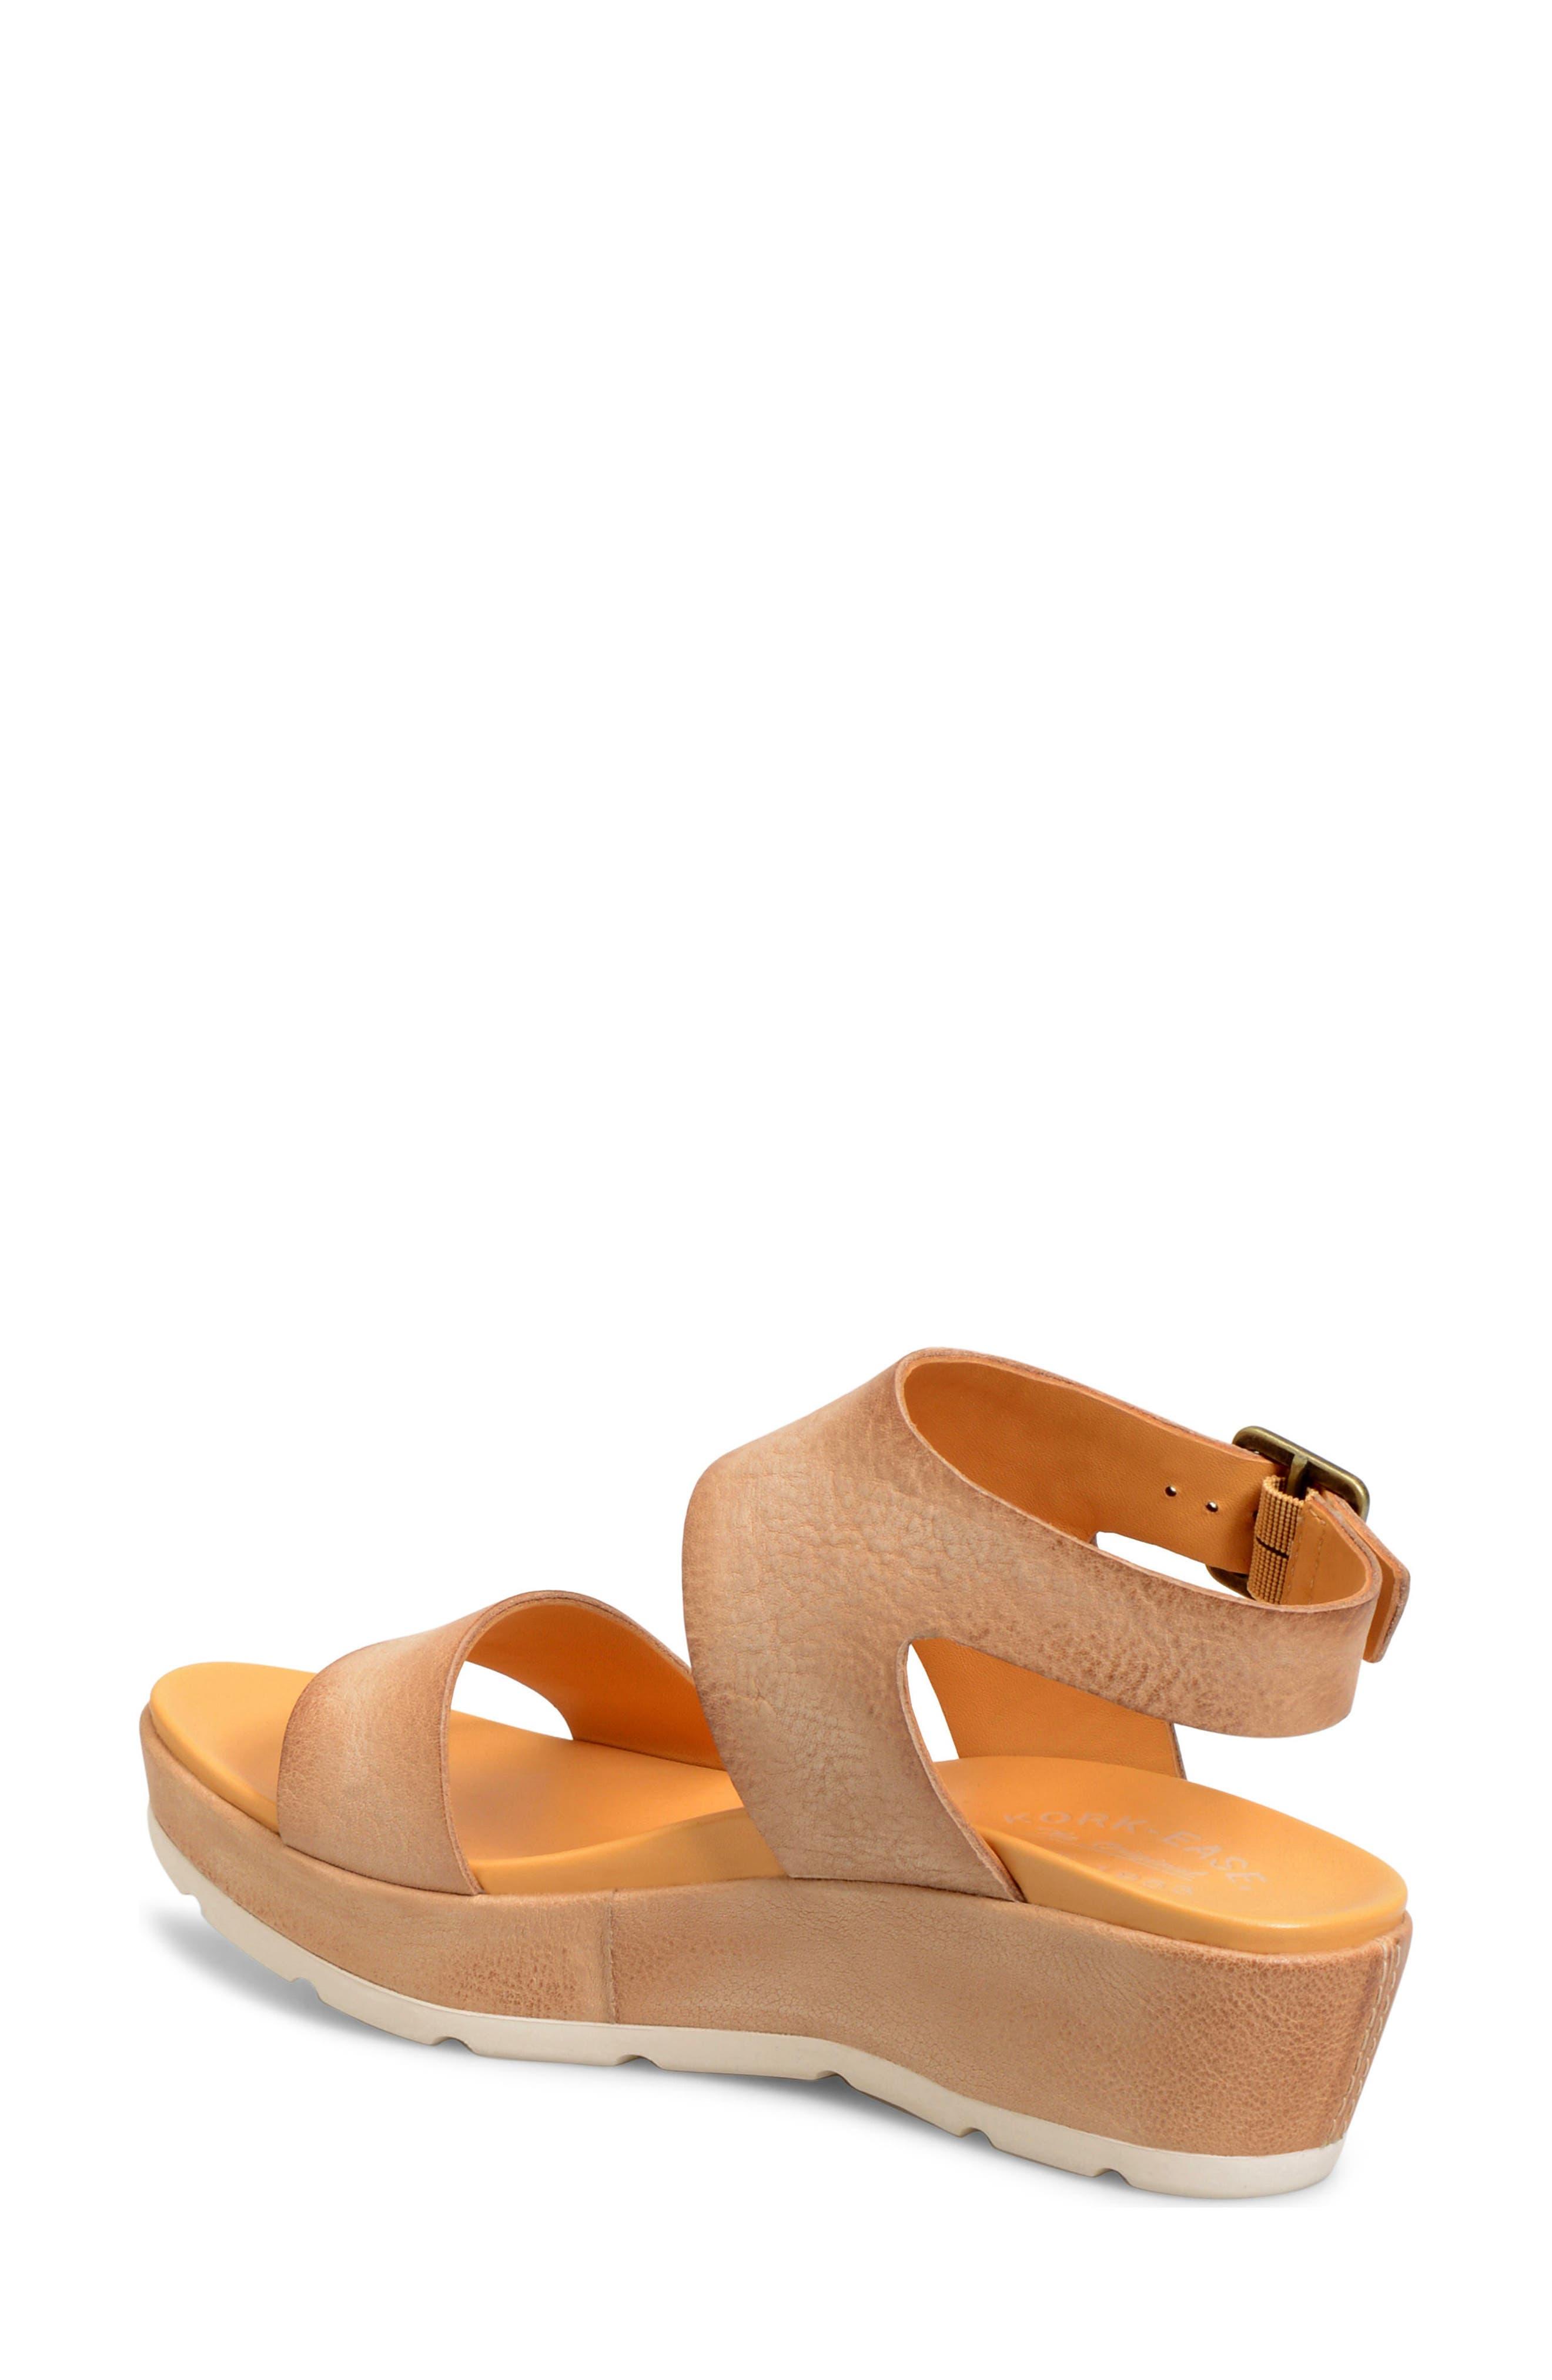 'Khloe' Platform Wedge Sandal,                             Alternate thumbnail 9, color,